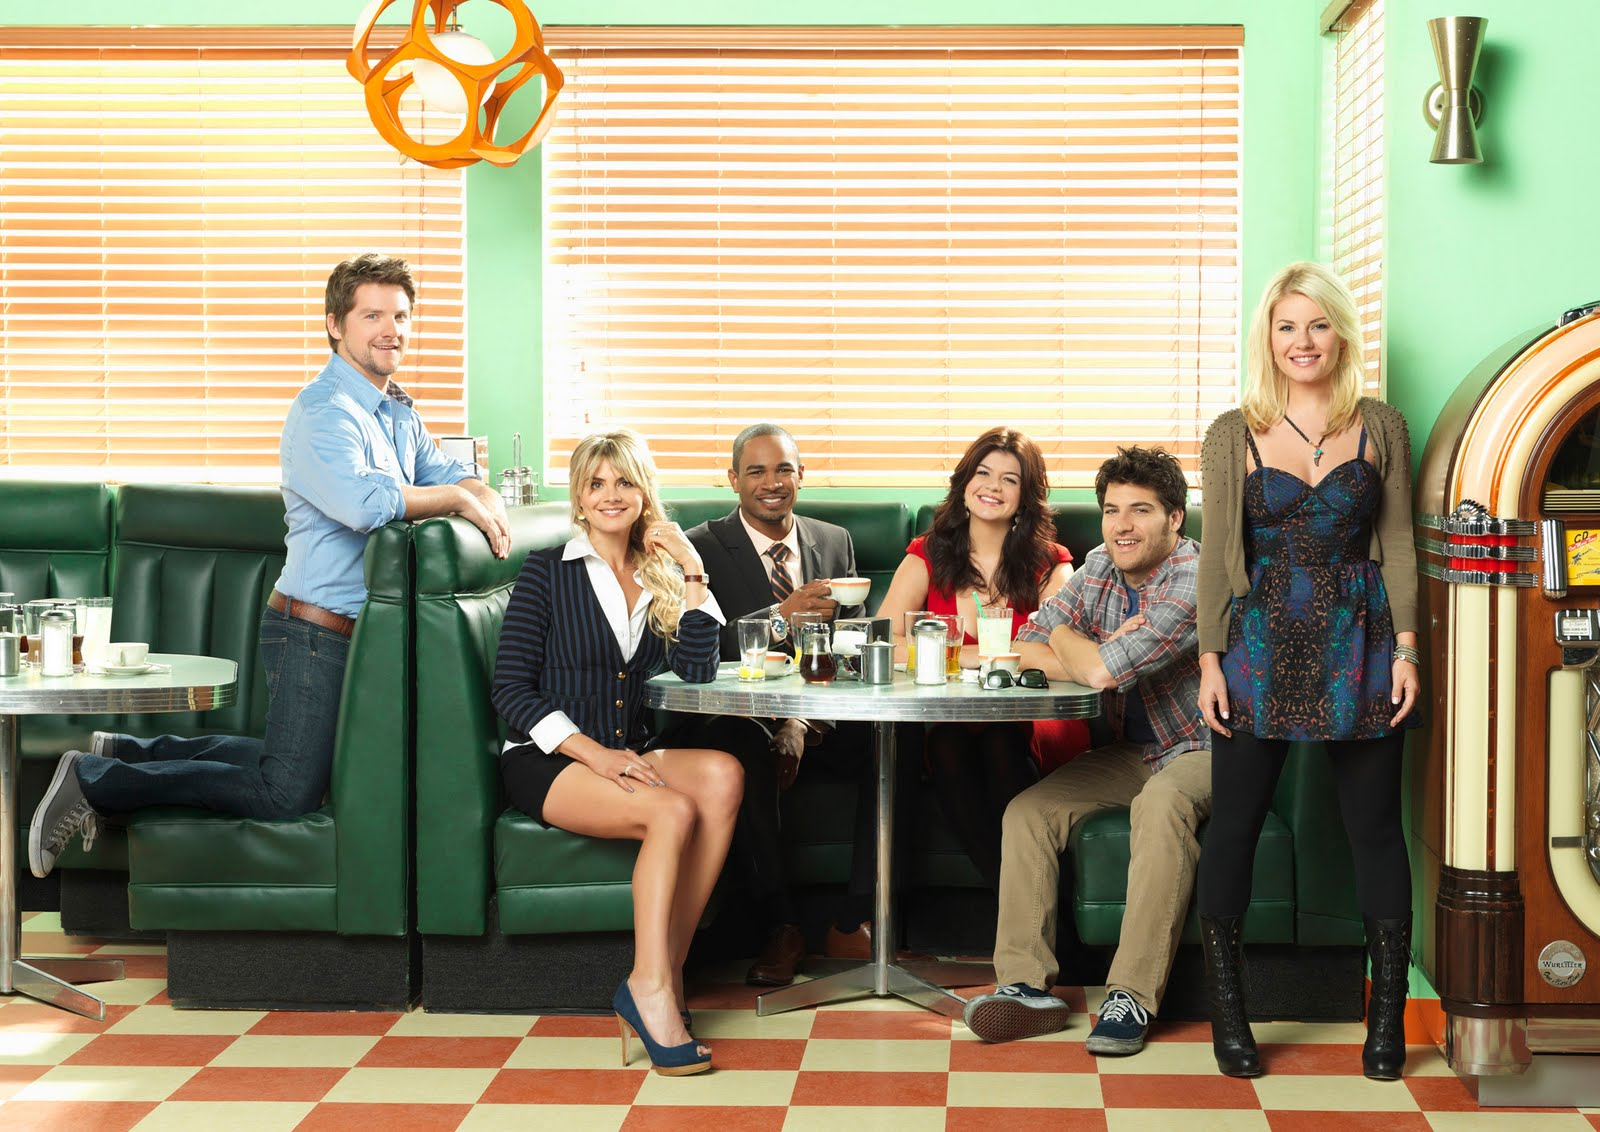 http://3.bp.blogspot.com/-6TFxhJsfhSA/TxIB8-o3kXI/AAAAAAAAEDI/J01ZMgkkqrw/s1600/Happy-Endings-Zachary-Knighton-Eliza-Coupe-Damon-Wayans-Jr.-Casey-Wilson-Adam-Polly-Elisha-Cuthbert.jpg